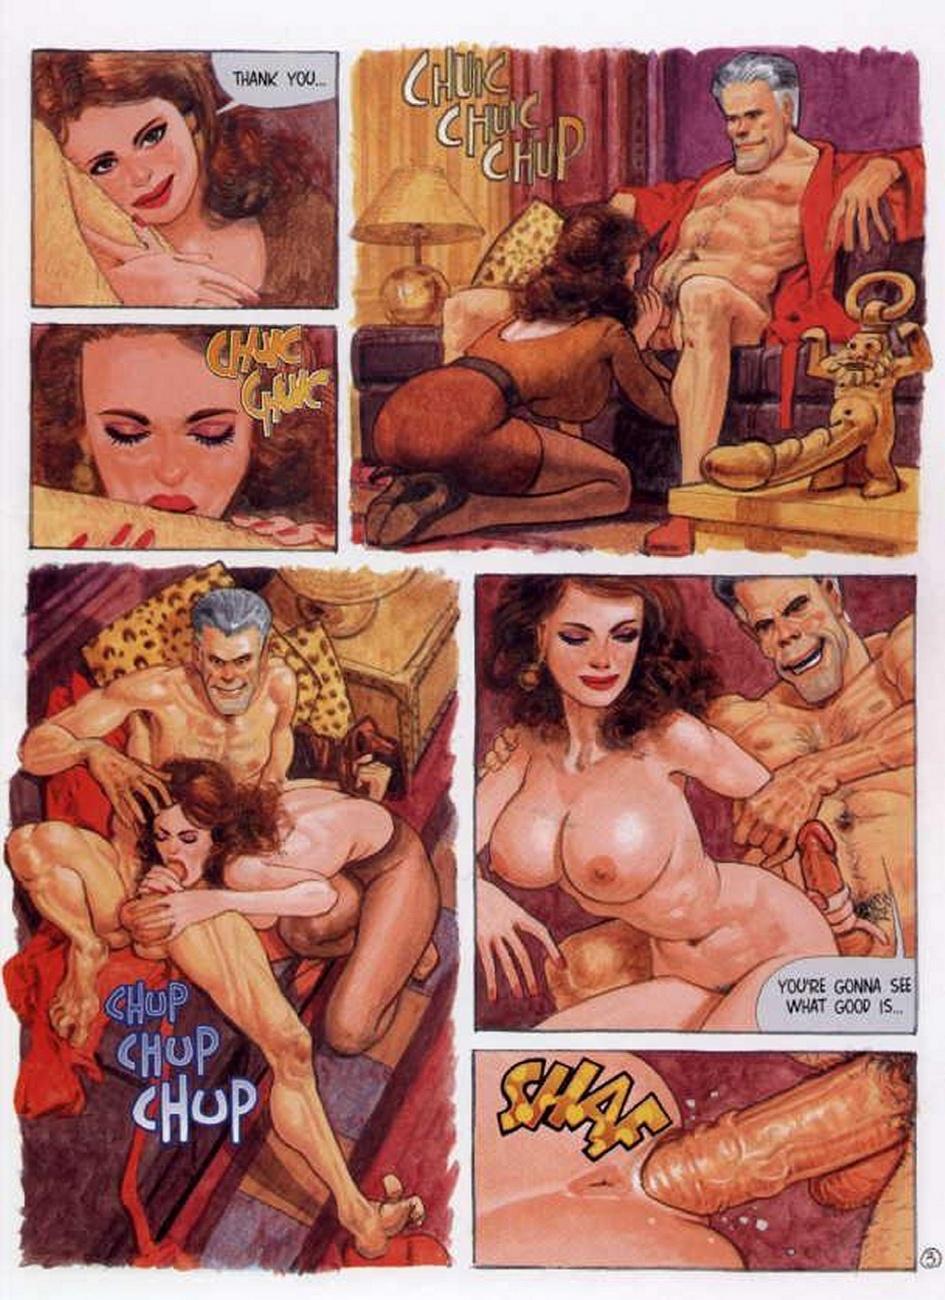 gulag-filmi-porno